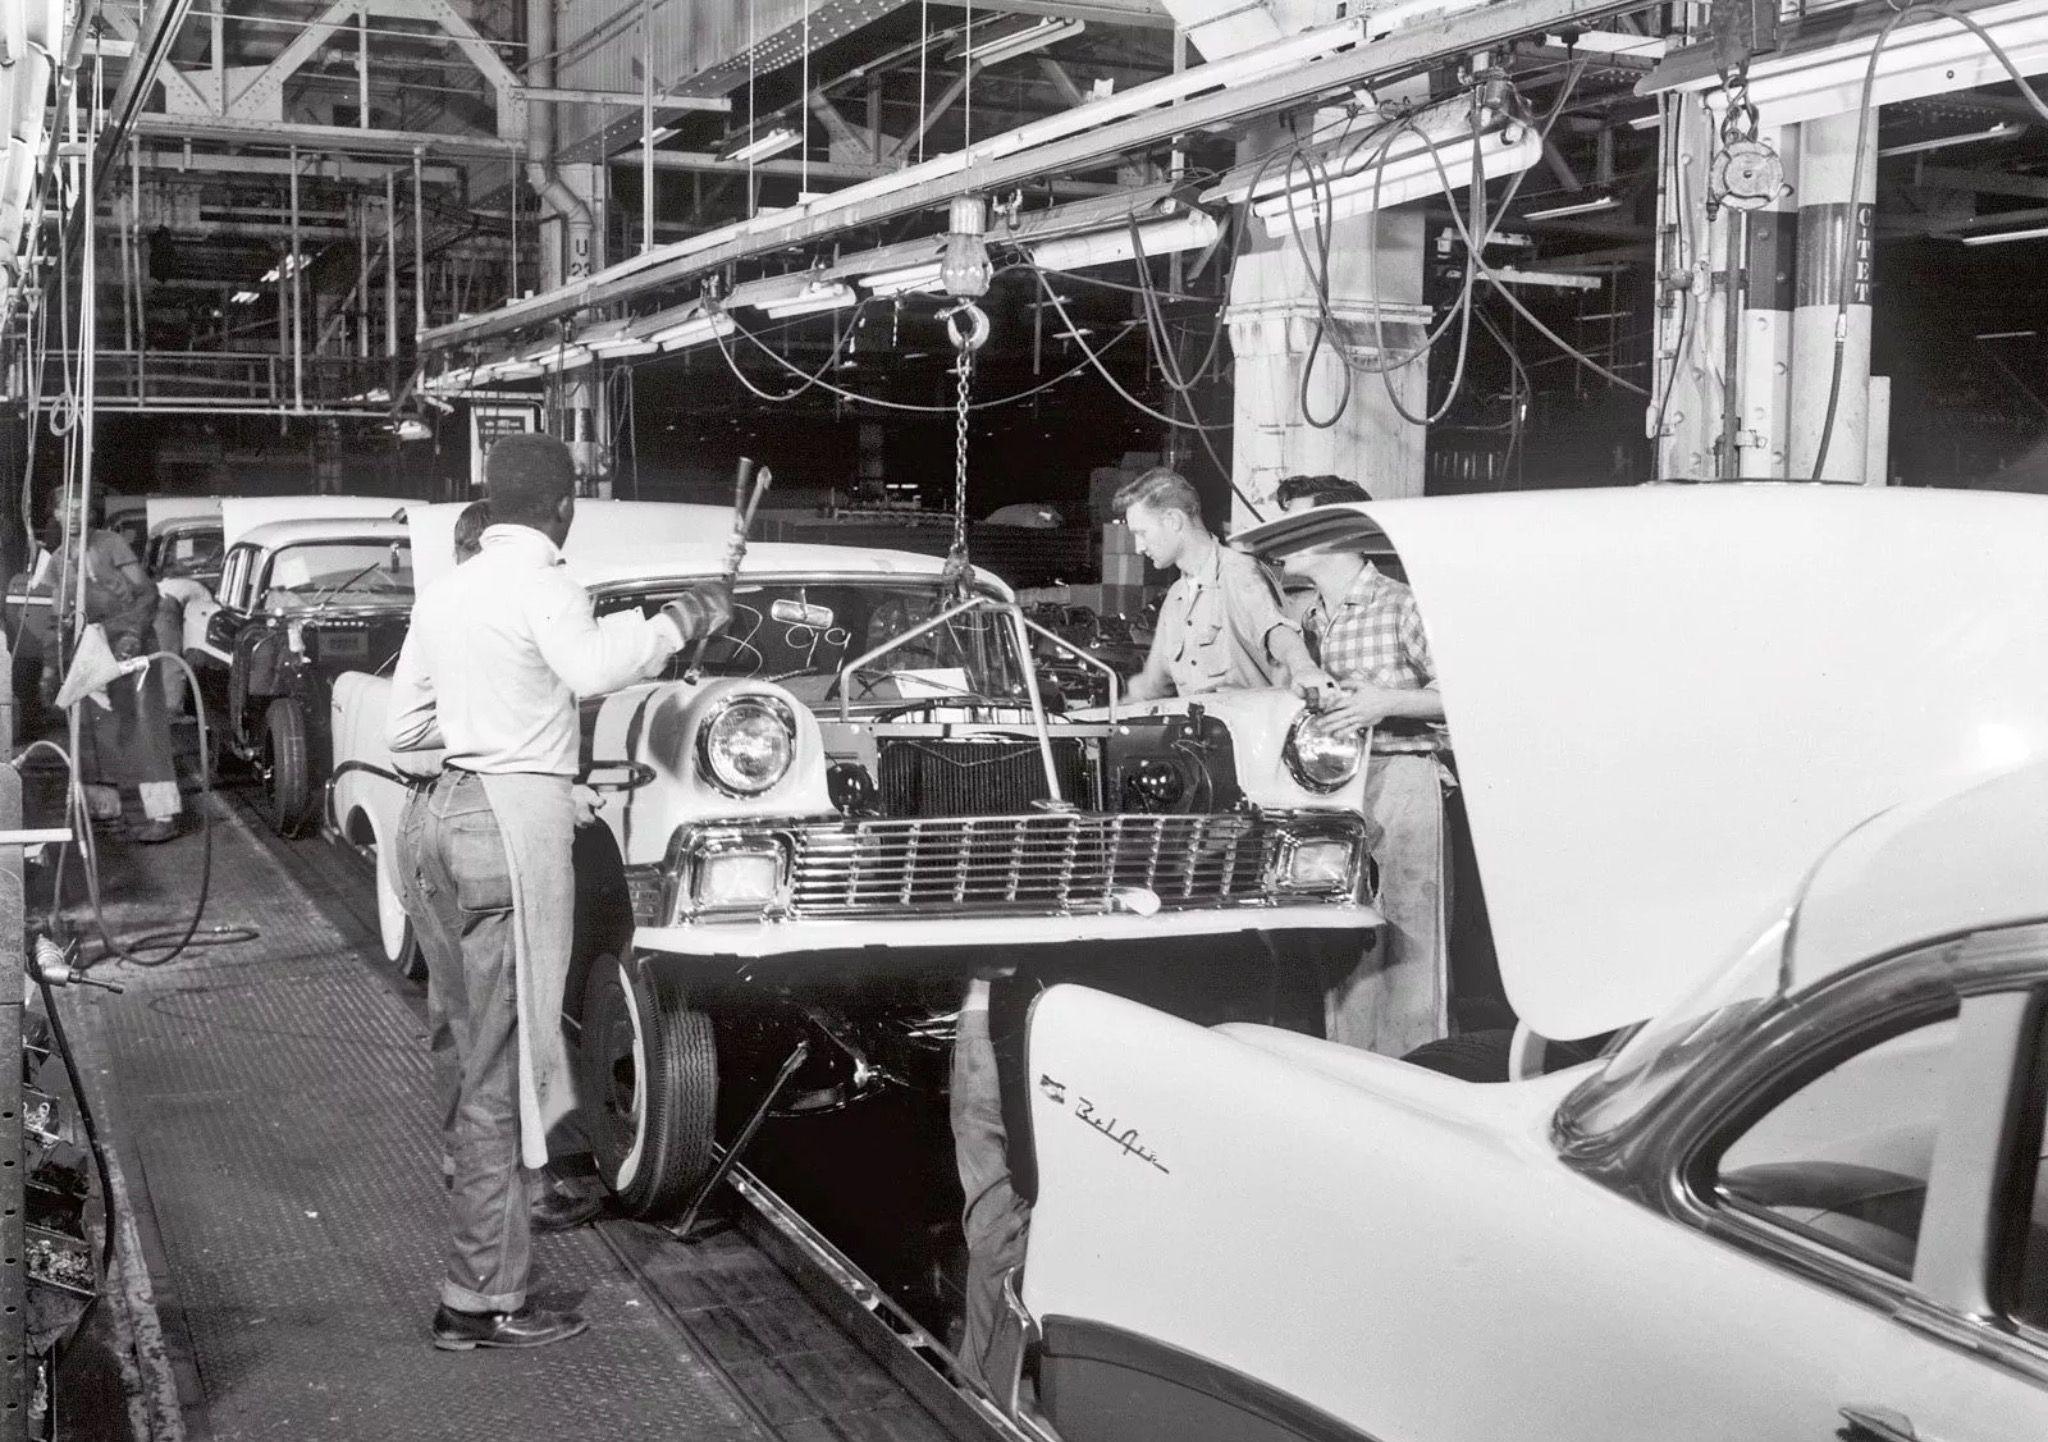 Pin by Wagon Guy on 1956 Chevrolet Chevrolet, 1956 chevy